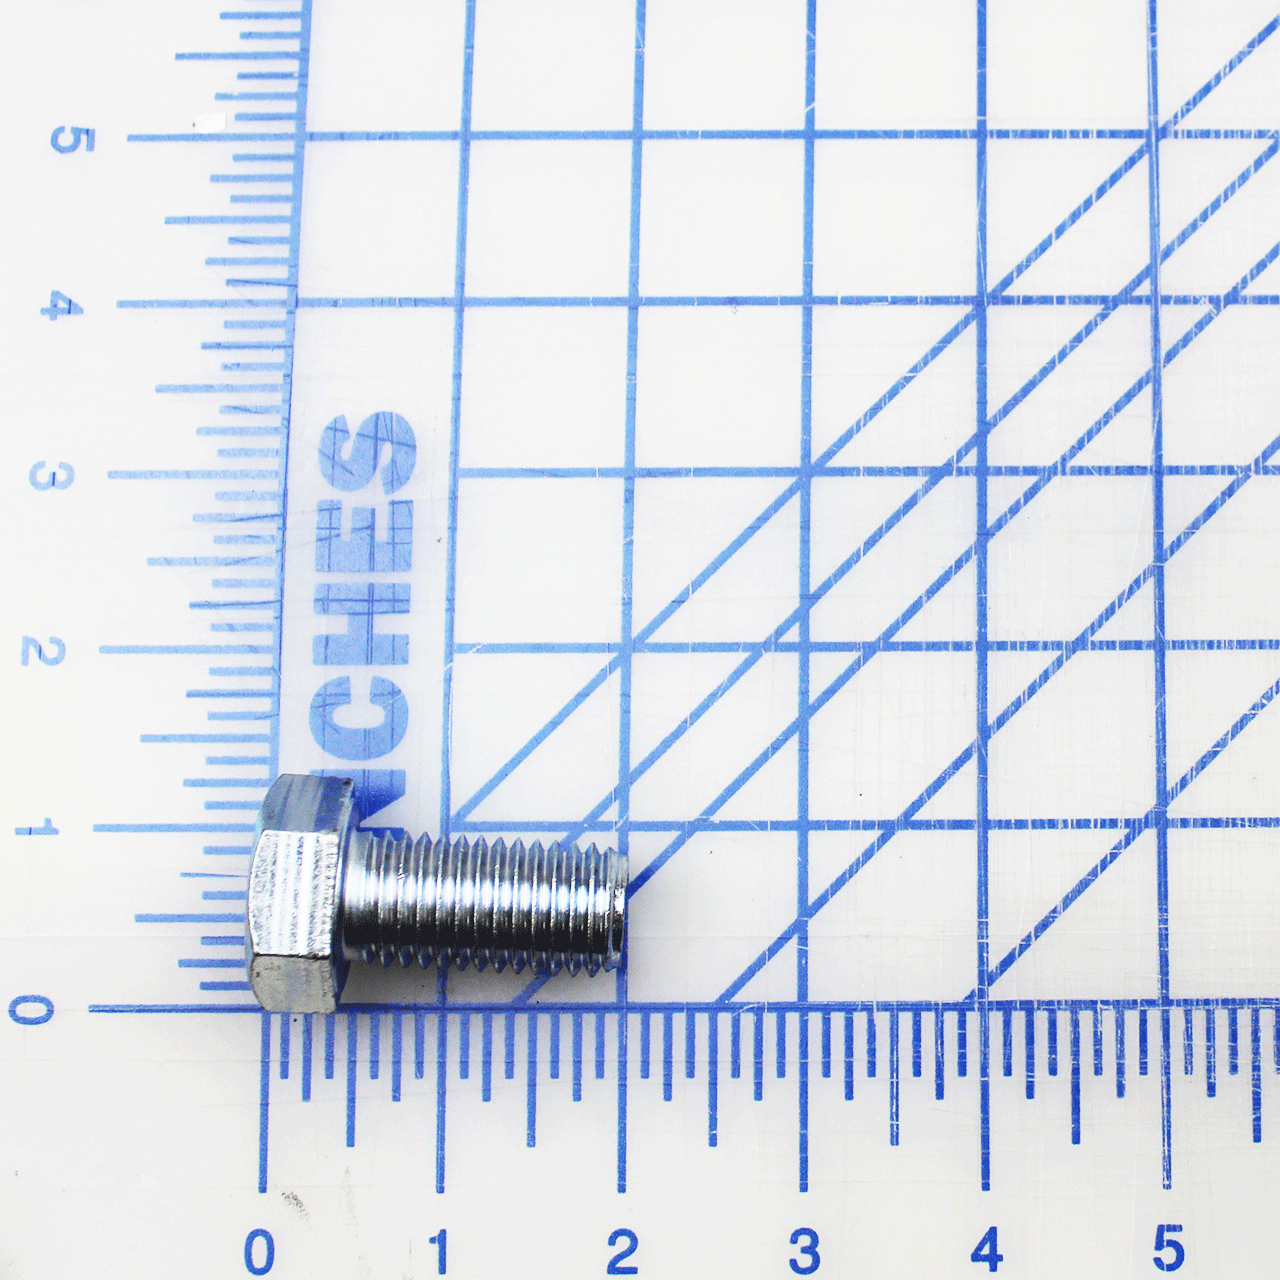 Sechskantschraube 3//4-10 UNC x 1 1//4 Grd Hex Head Cap Screw FT 5 verzinkt